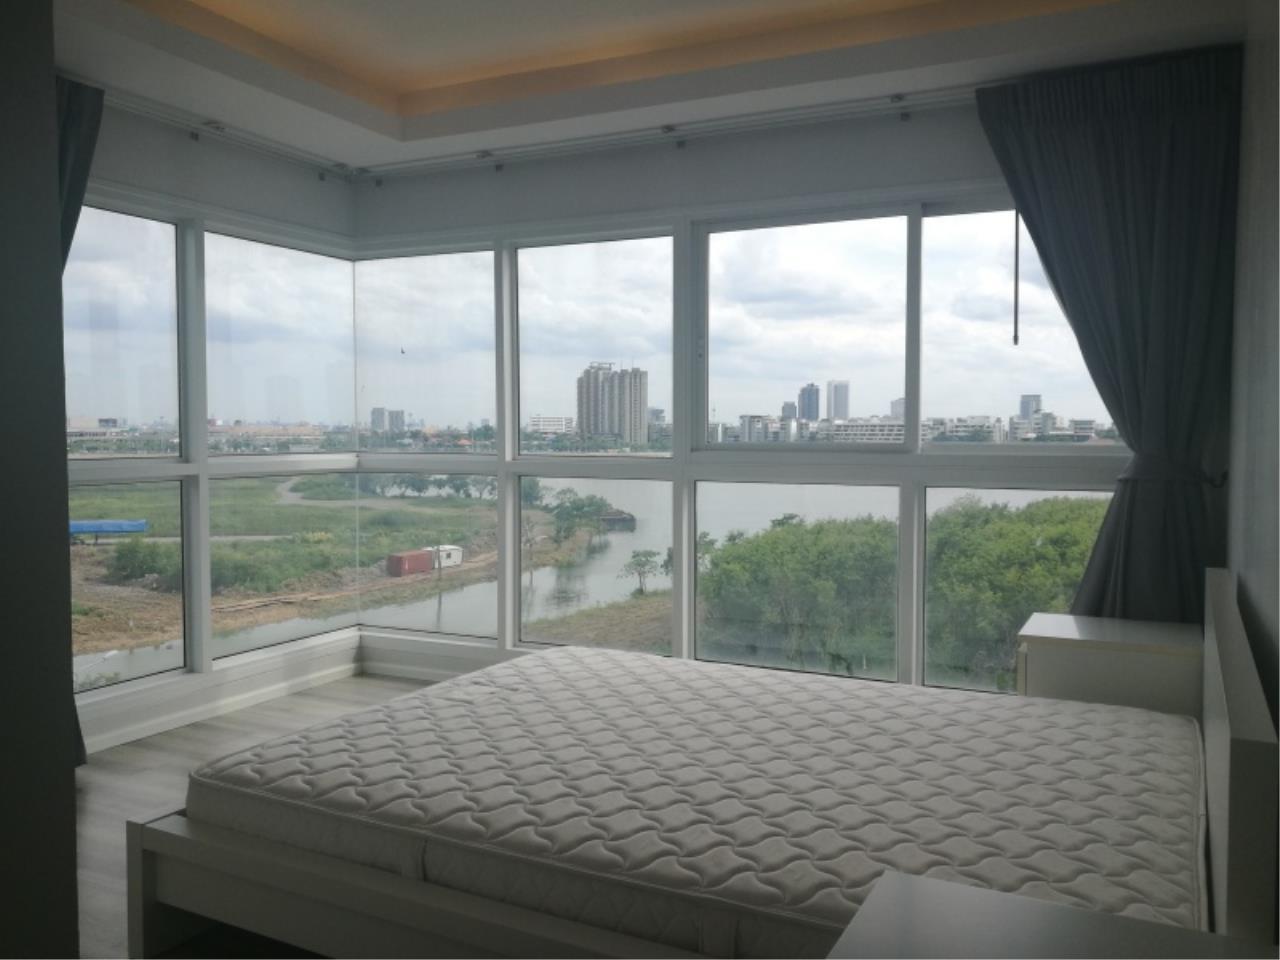 Century21 Skylux Agency's Double Lake Muang Thong Thani / Condo For Rent / 2 Bedroom / 57 SQM / Mueng Thong Thani / Bangkok 3